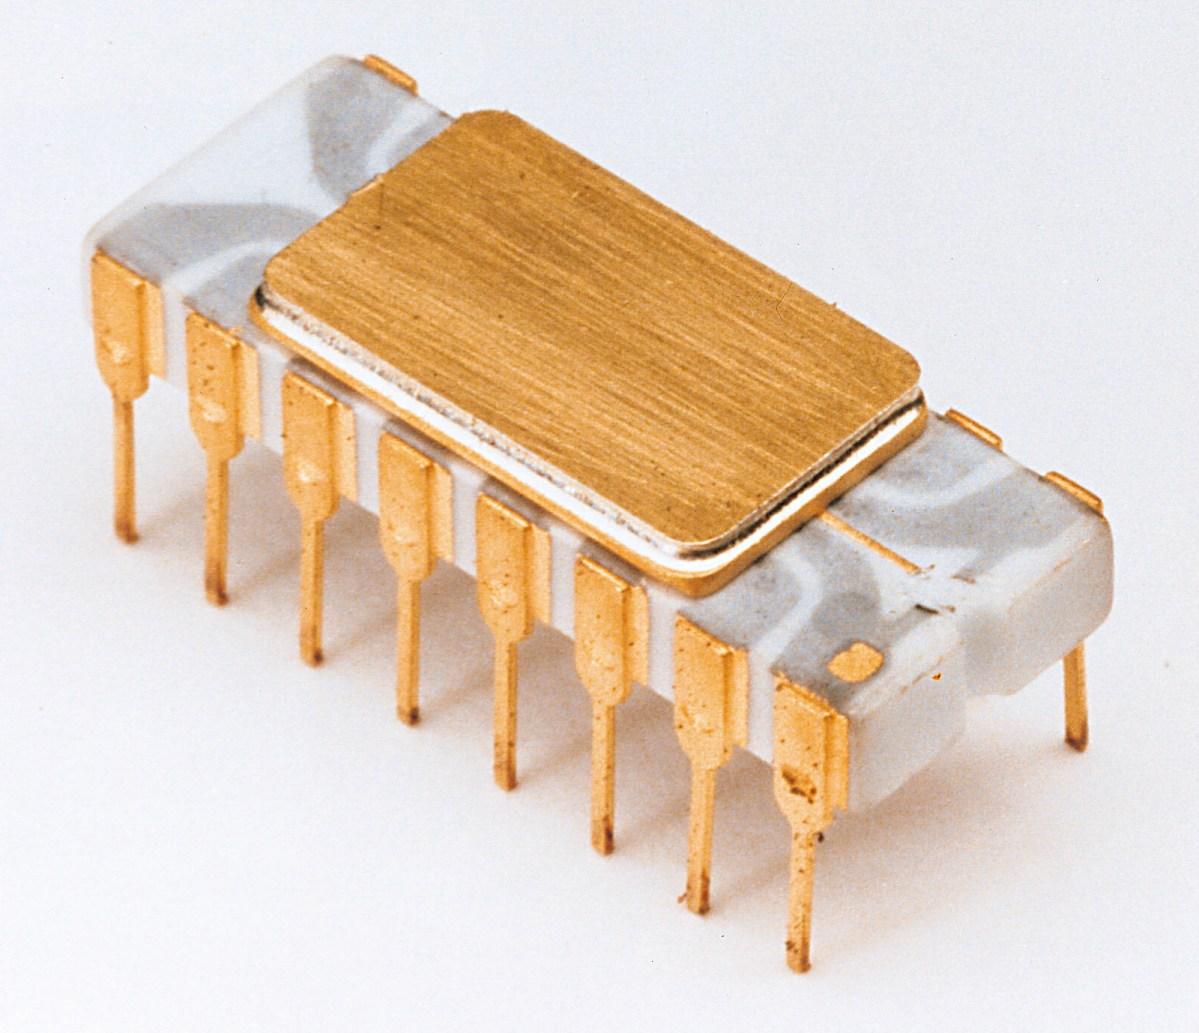 Ted Hoff's General Purpose Microprocessor